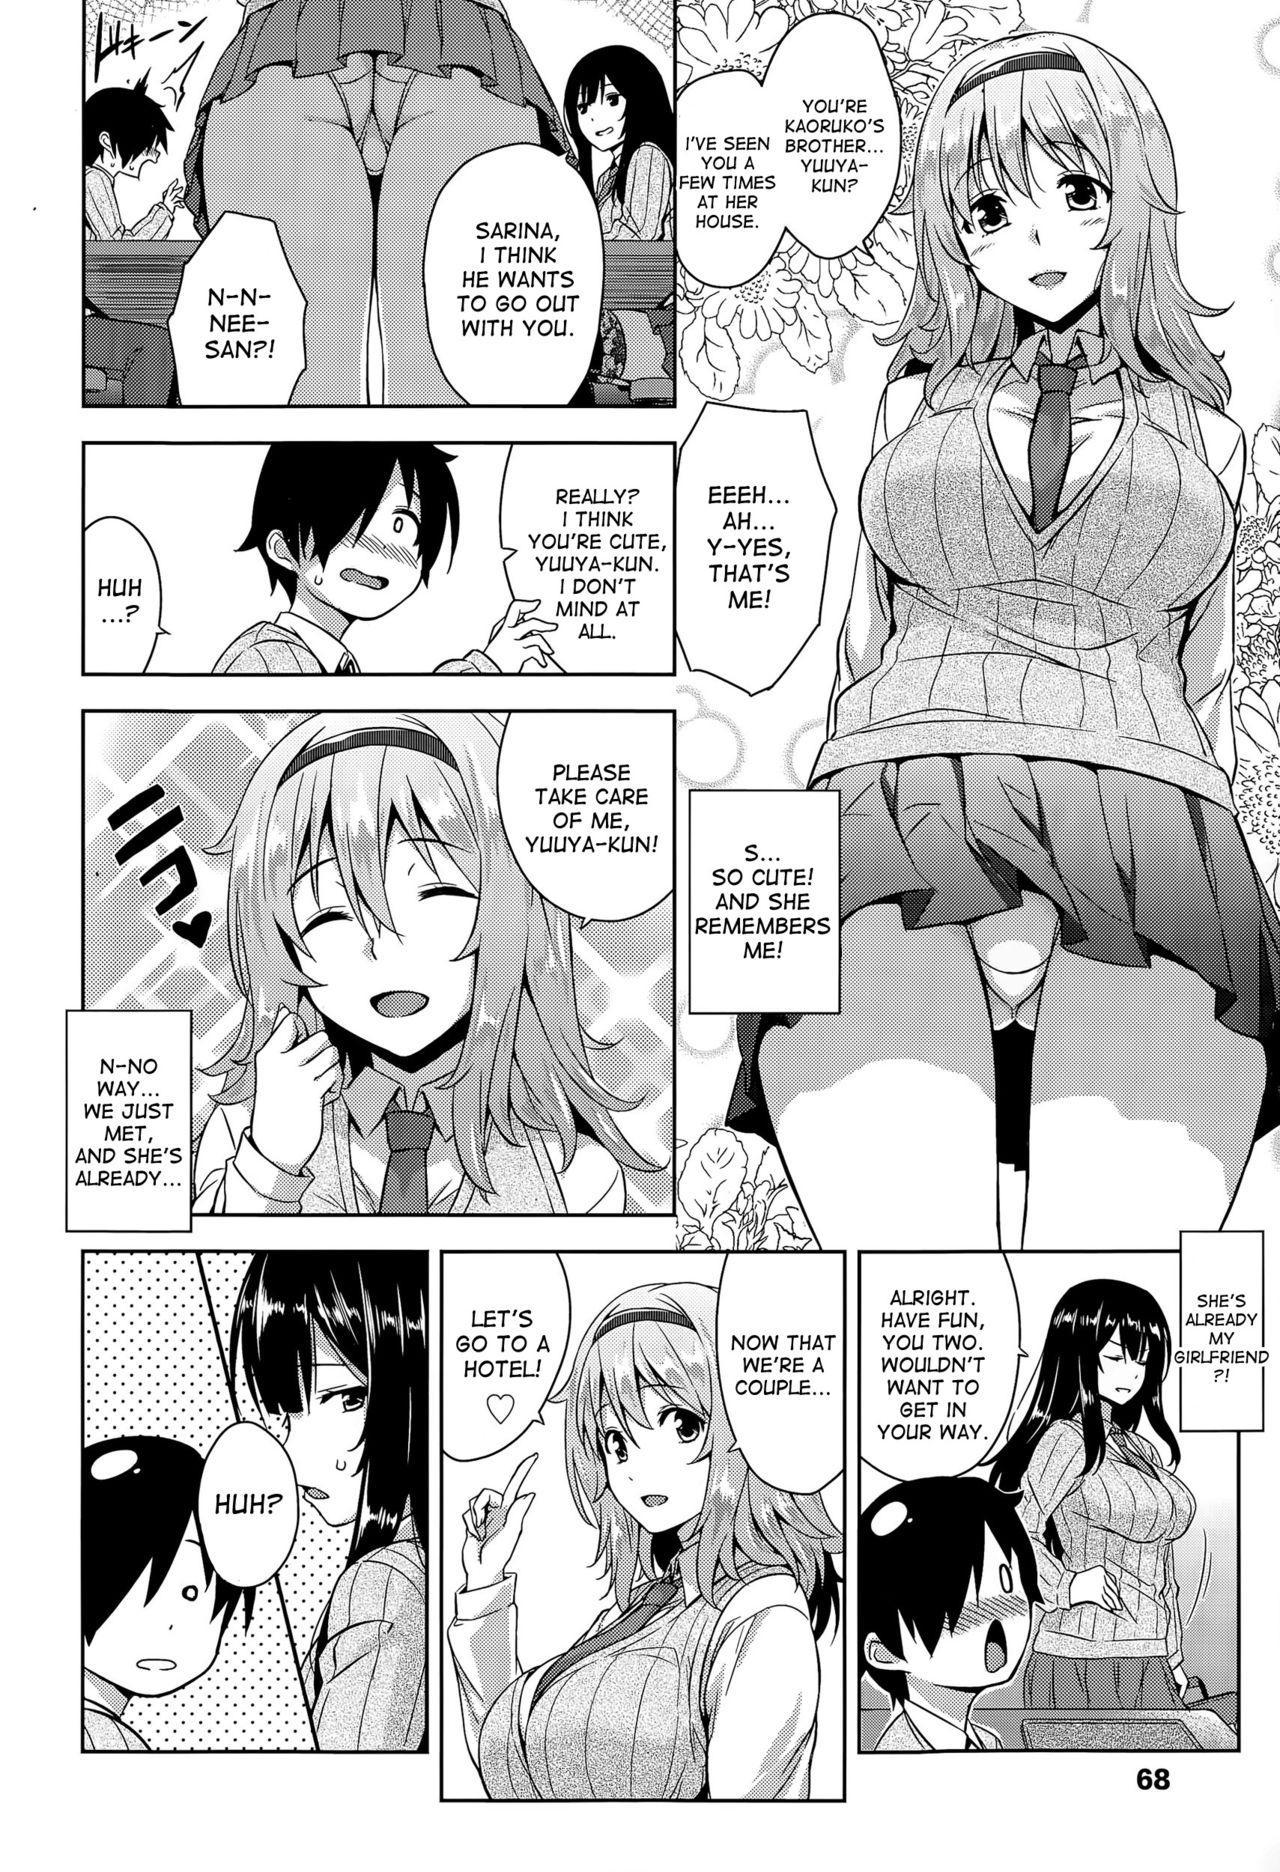 [Mikemono Yuu] Sokuhame! Onee-chans | Instant Sex! Onee-chans! (COMIC Koh Vol. 5) [English] [desudesu] 1